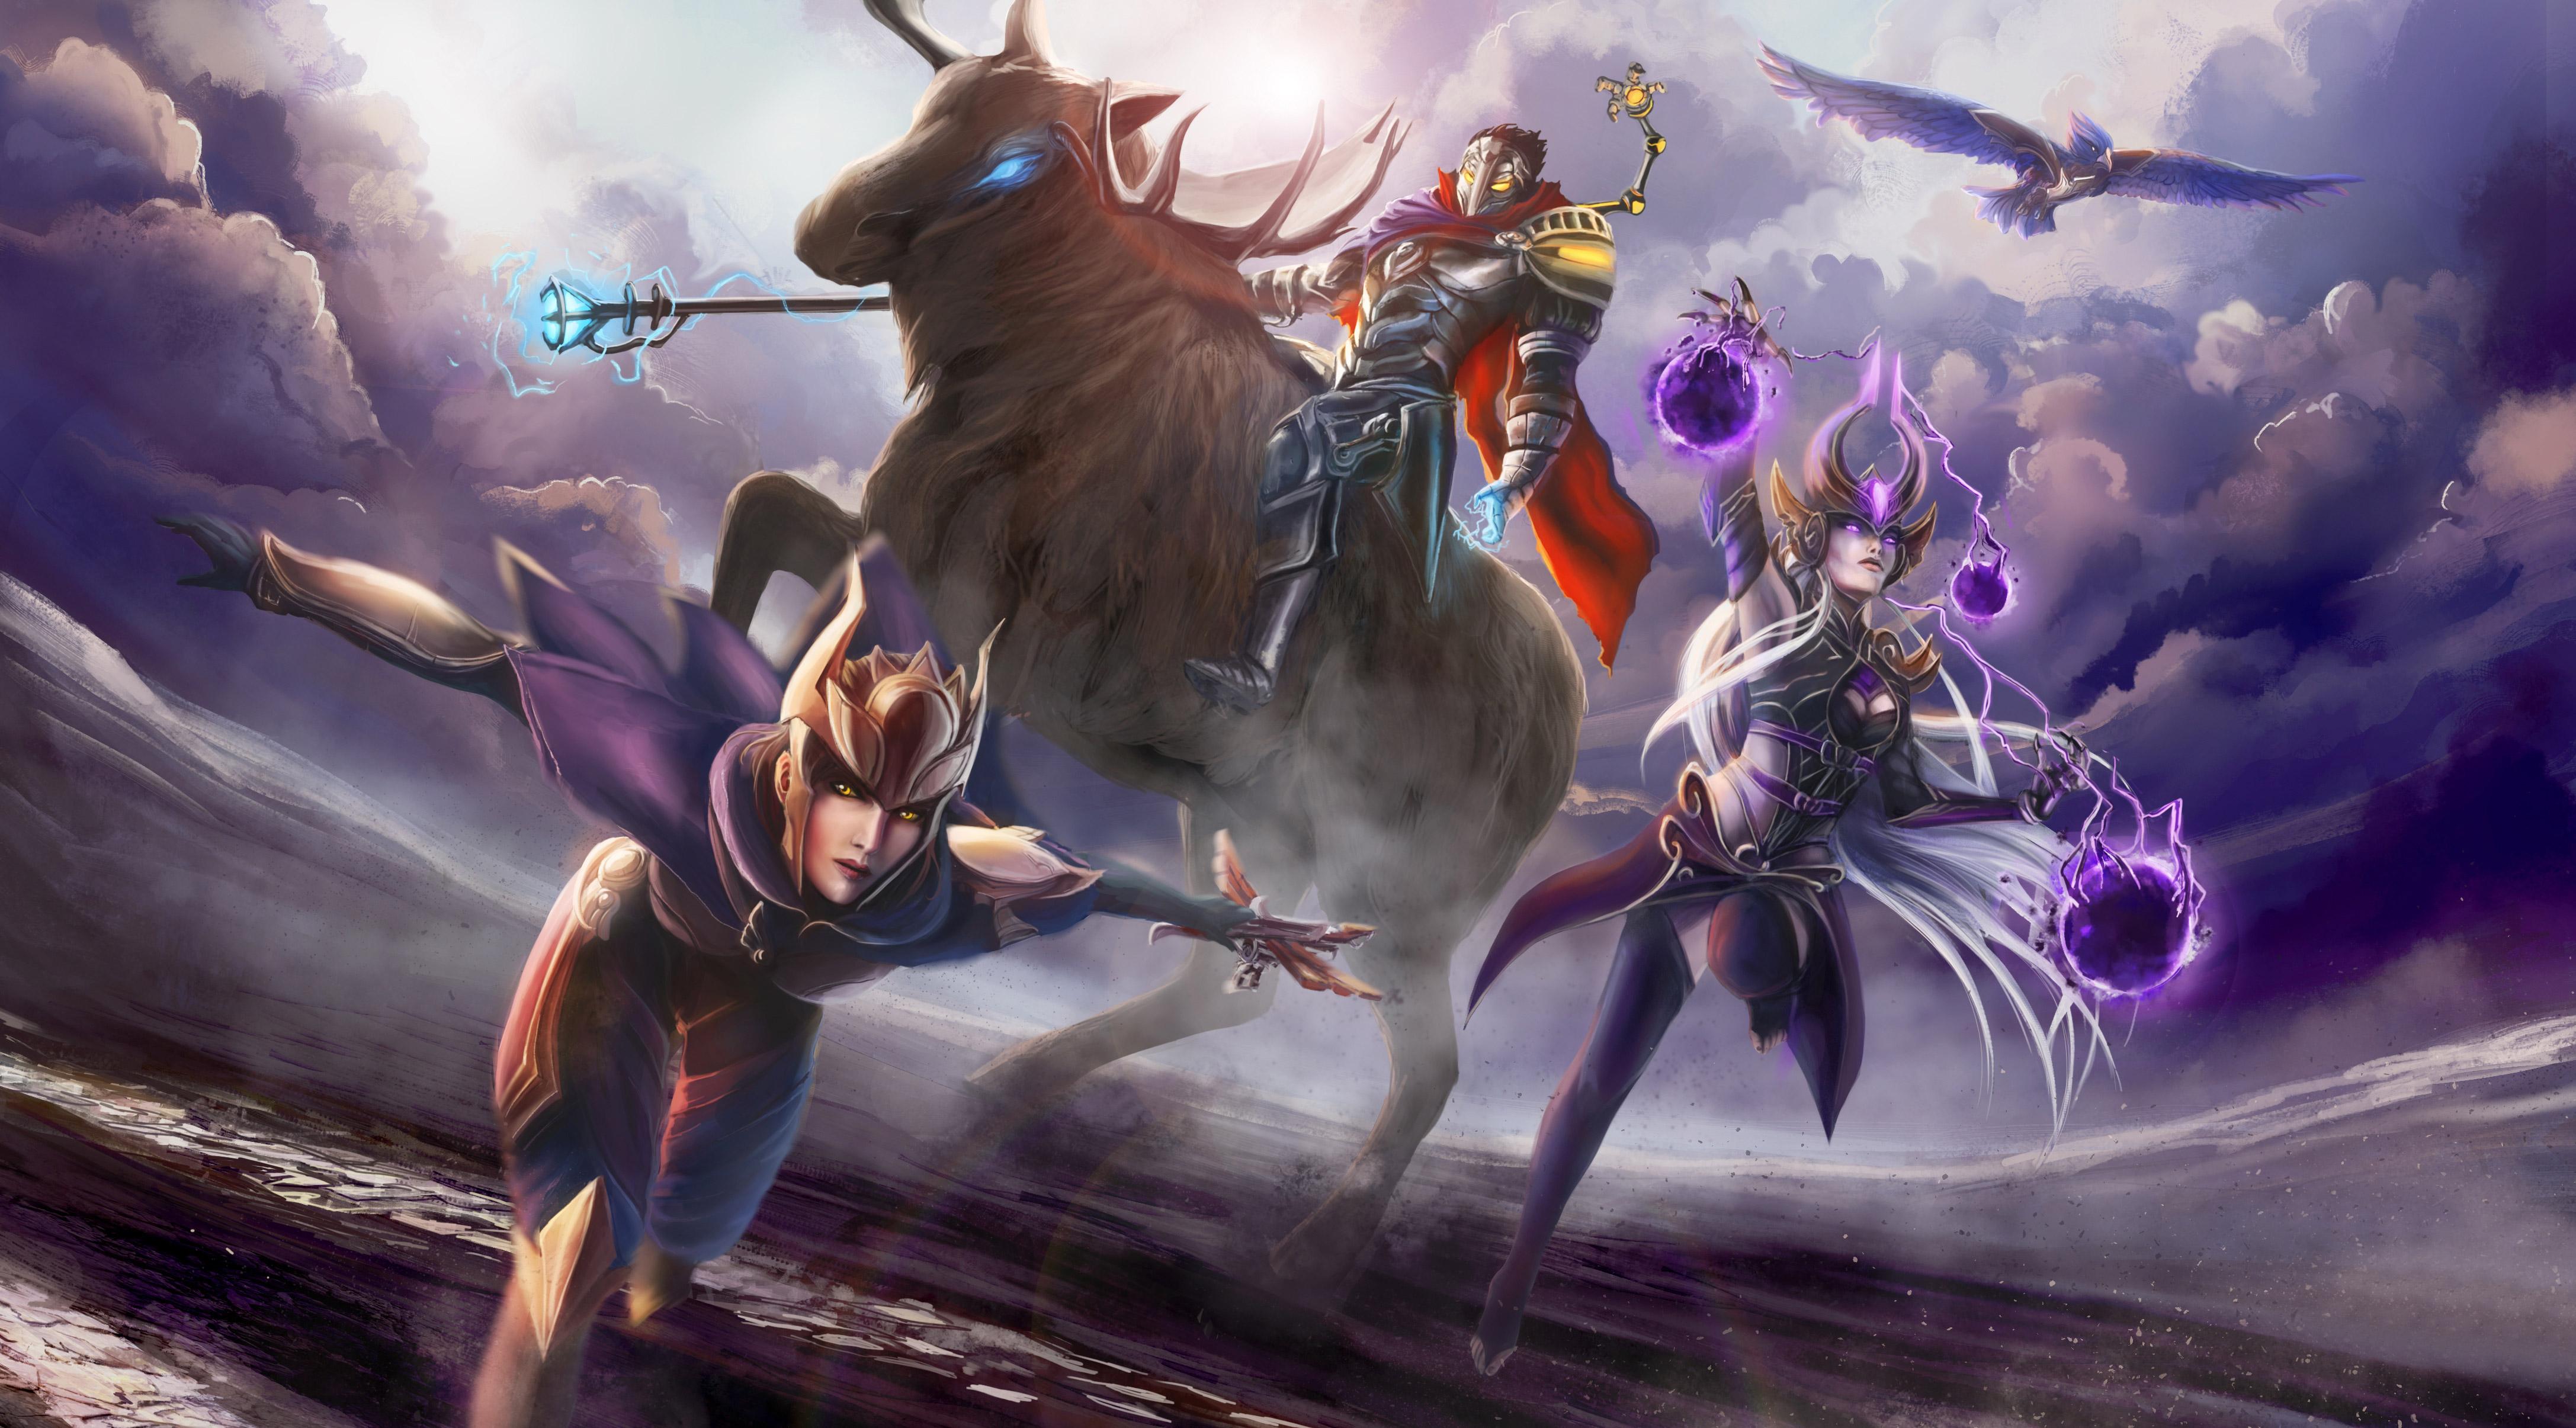 League Of Legends 4k Wallpaper: League Of Legends Shyvana Syndra Viktor, HD Games, 4k